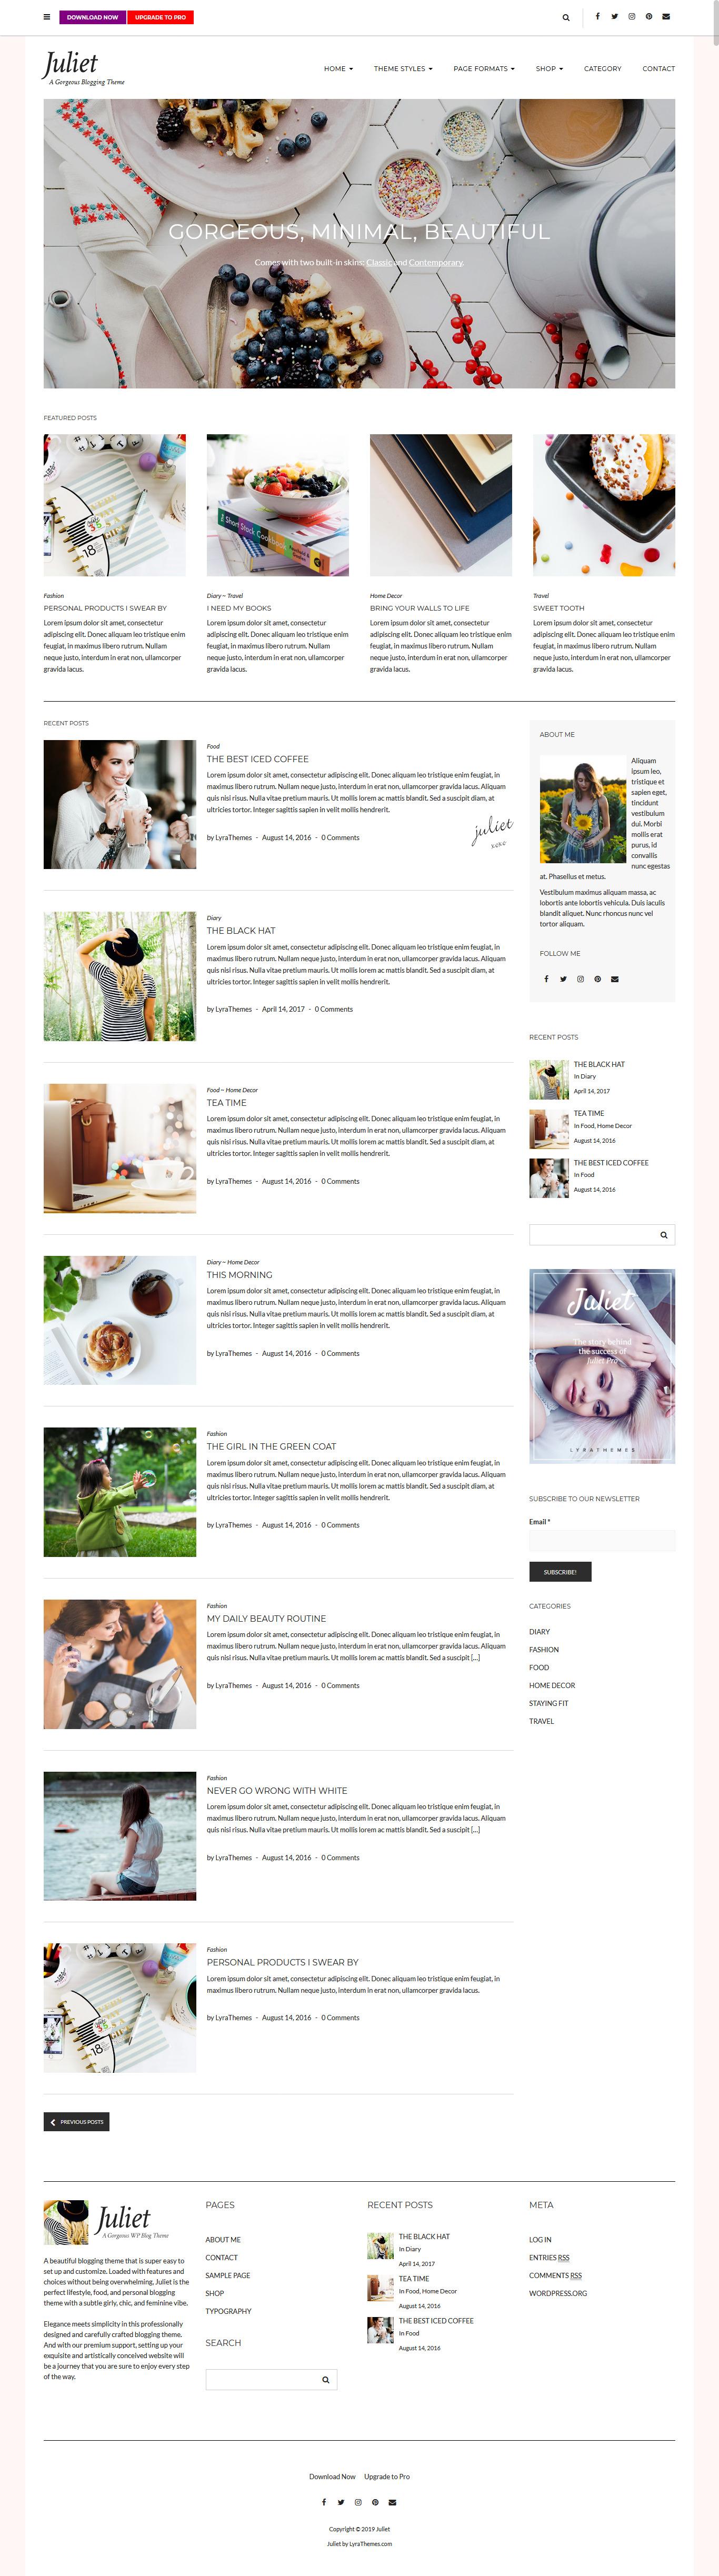 juliet best free feminine wordpress theme - 10+ Best Free Feminine WordPress Themes